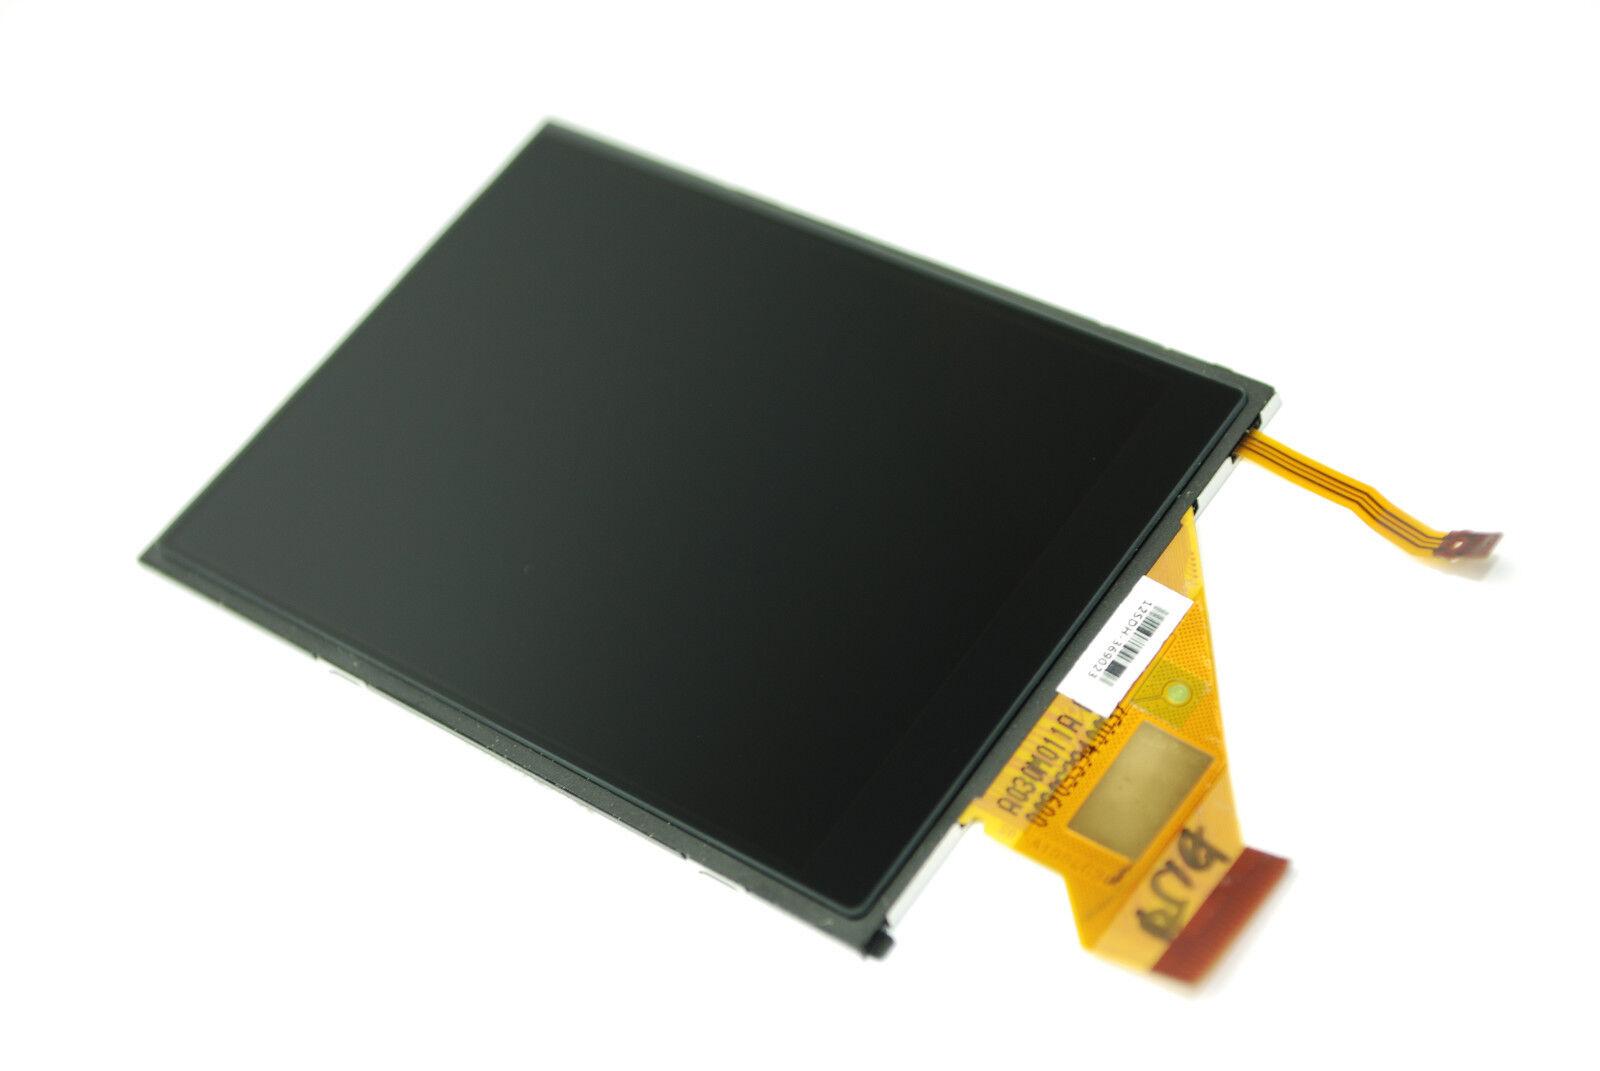 CCD Canon PowerShot SX600 HS LENS ZOOM UNIT REPLACEMENT ASSEMBLY